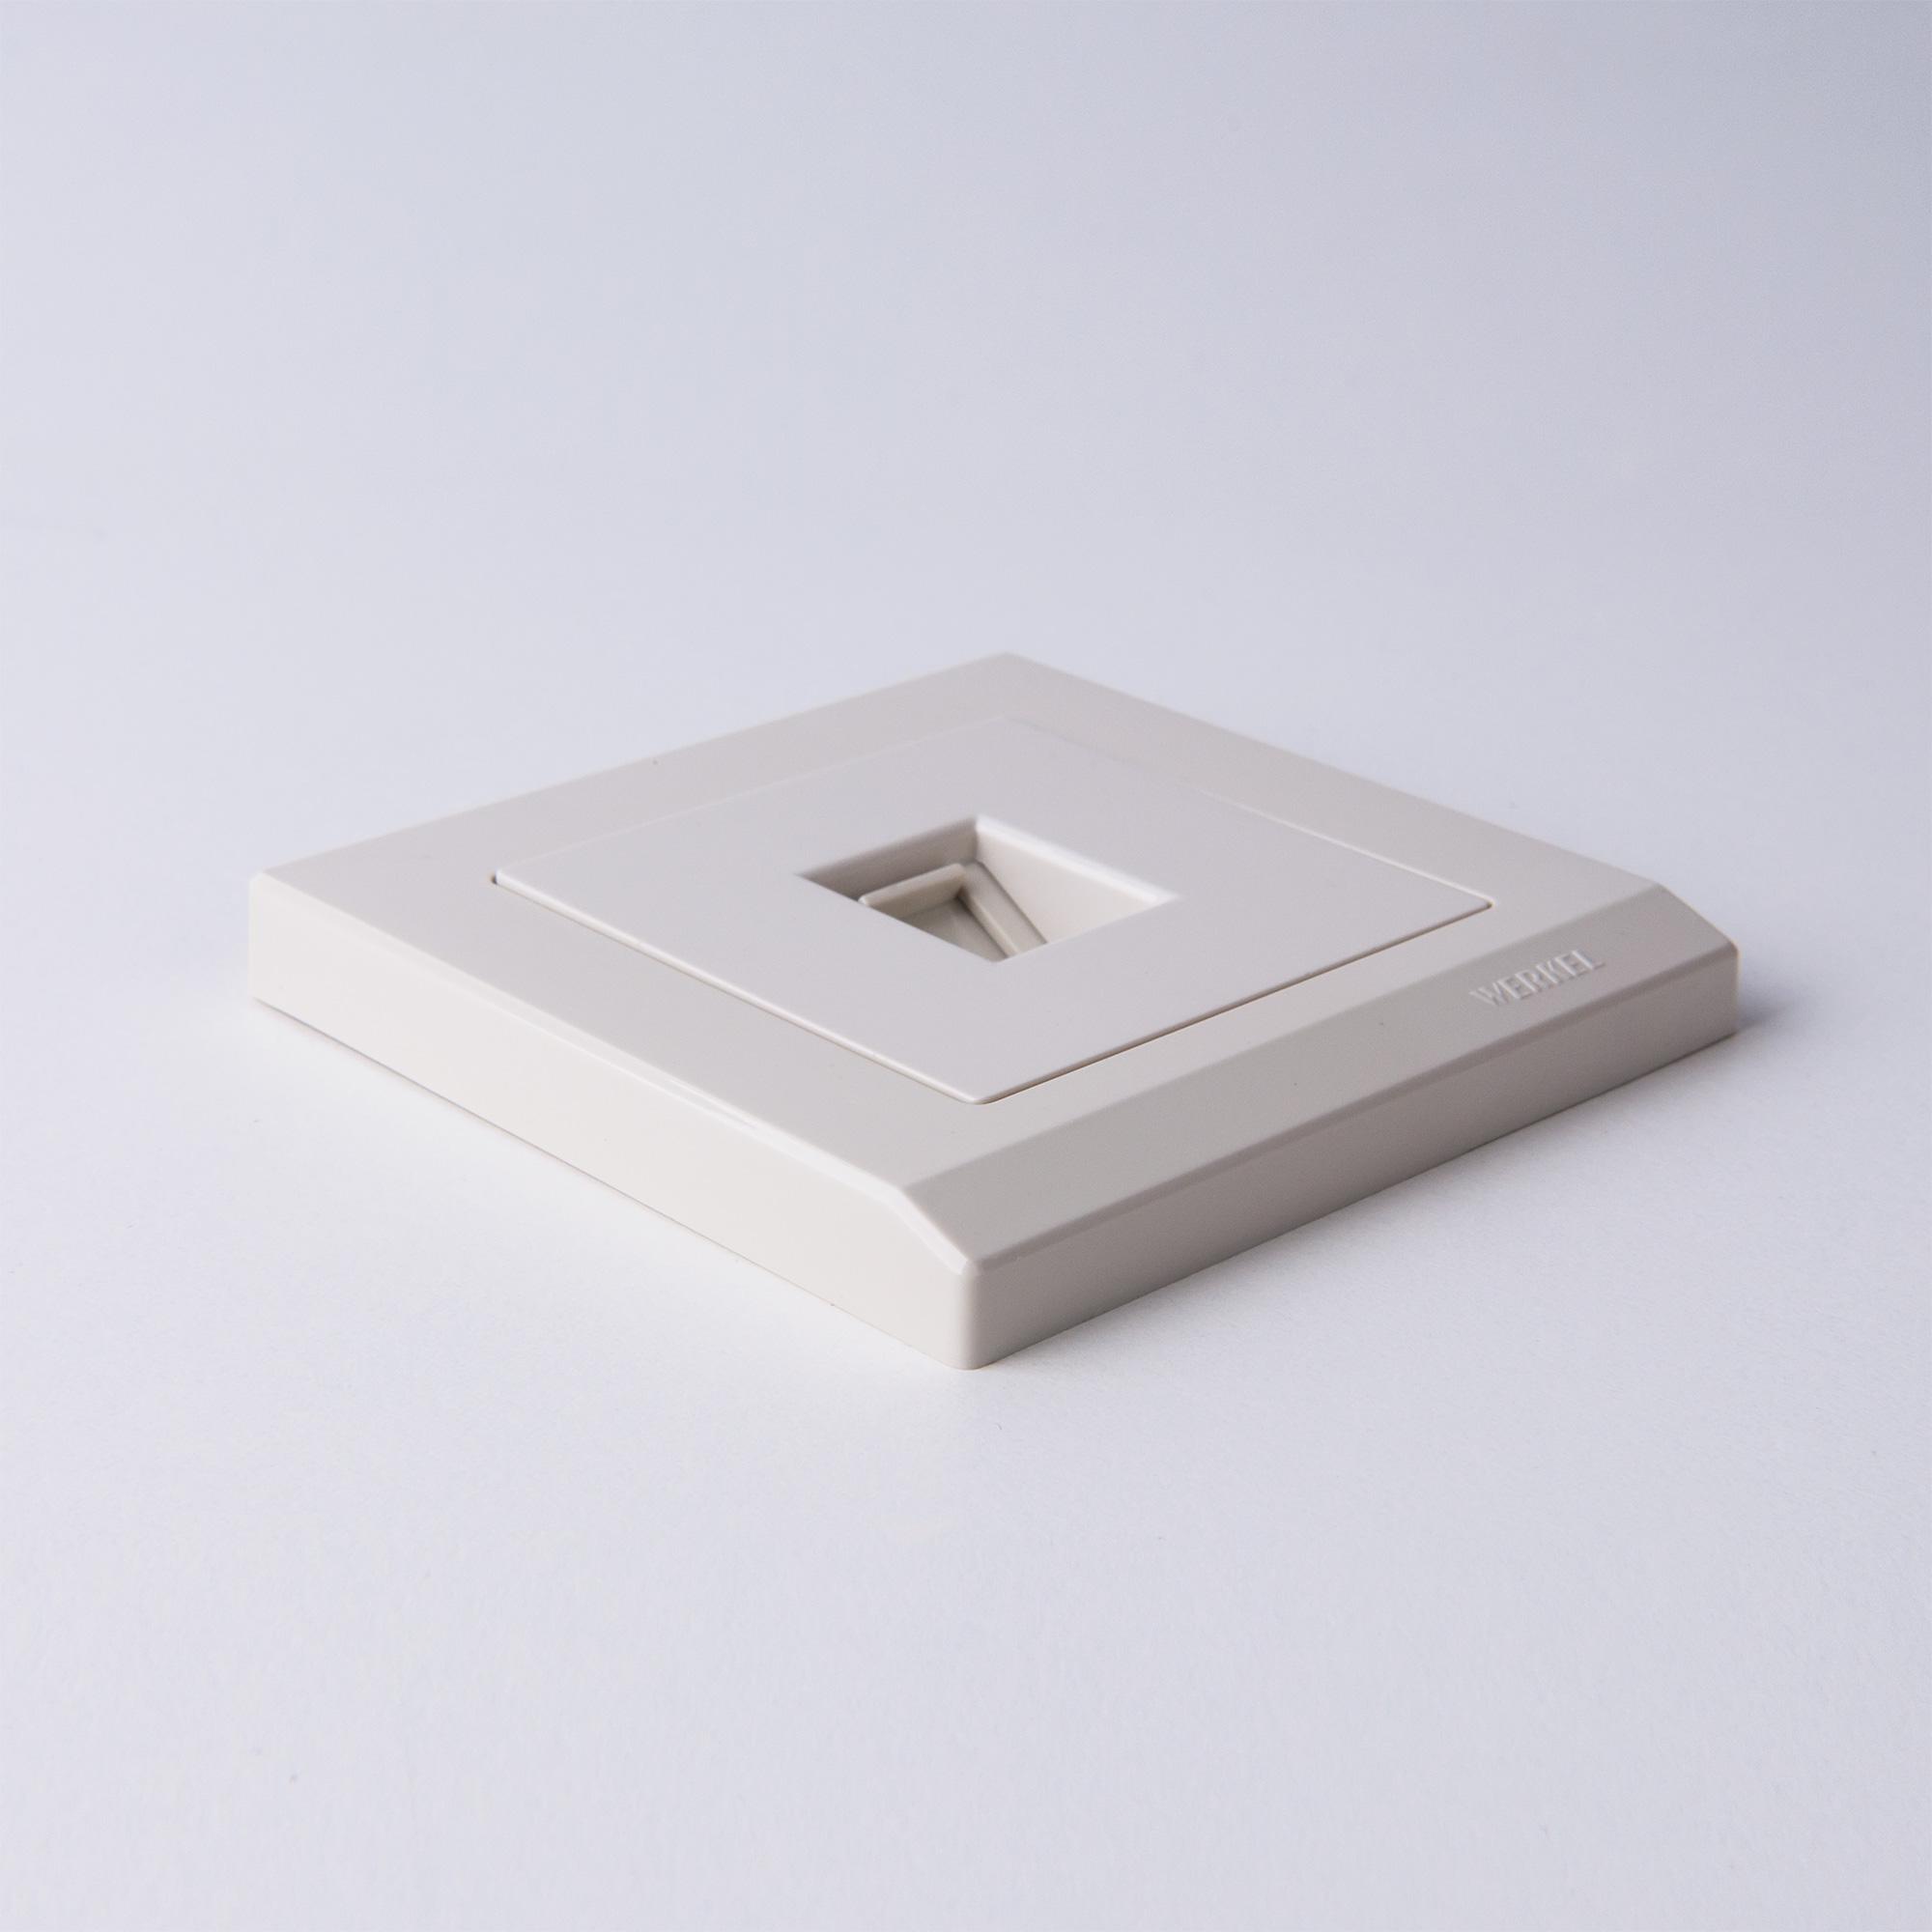 Розетка Ethernet RJ-45 (слоновая кость) W1181003